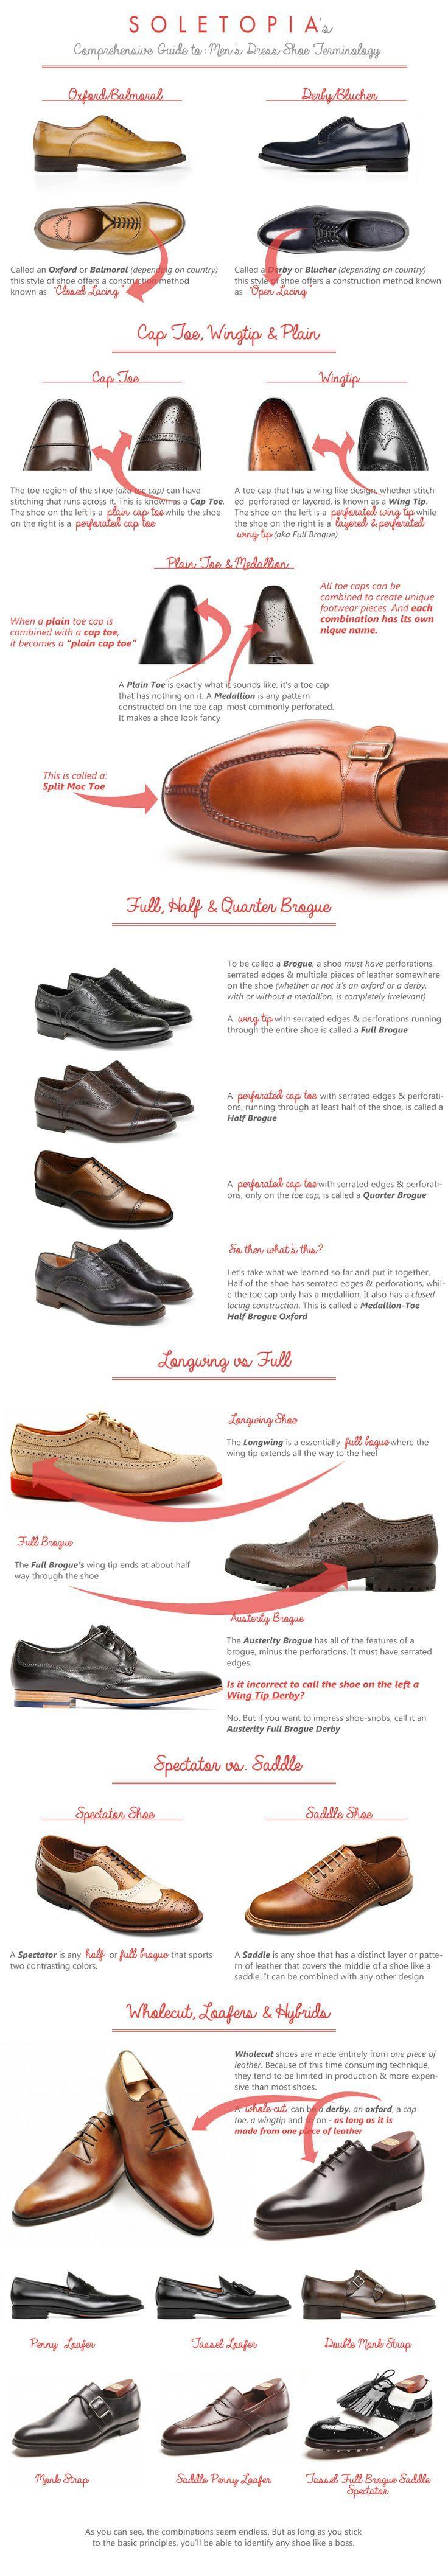 A Guide to Men's Dress Shoe Terminology | The Baum List